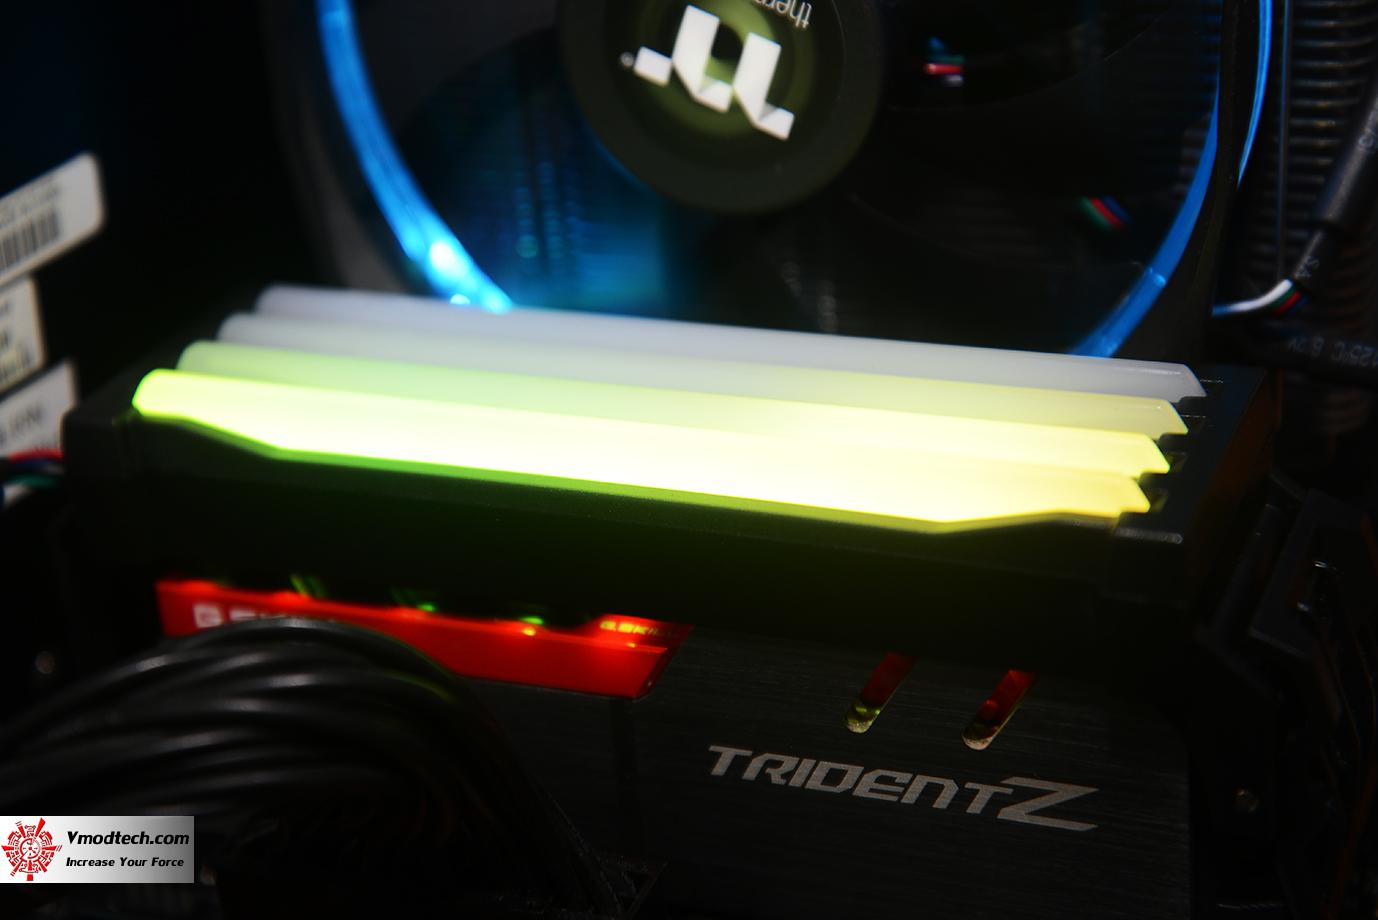 dsc 5590 Thermaltake Pacific R1 Plus DDR4 Memory Lighting Kit Review